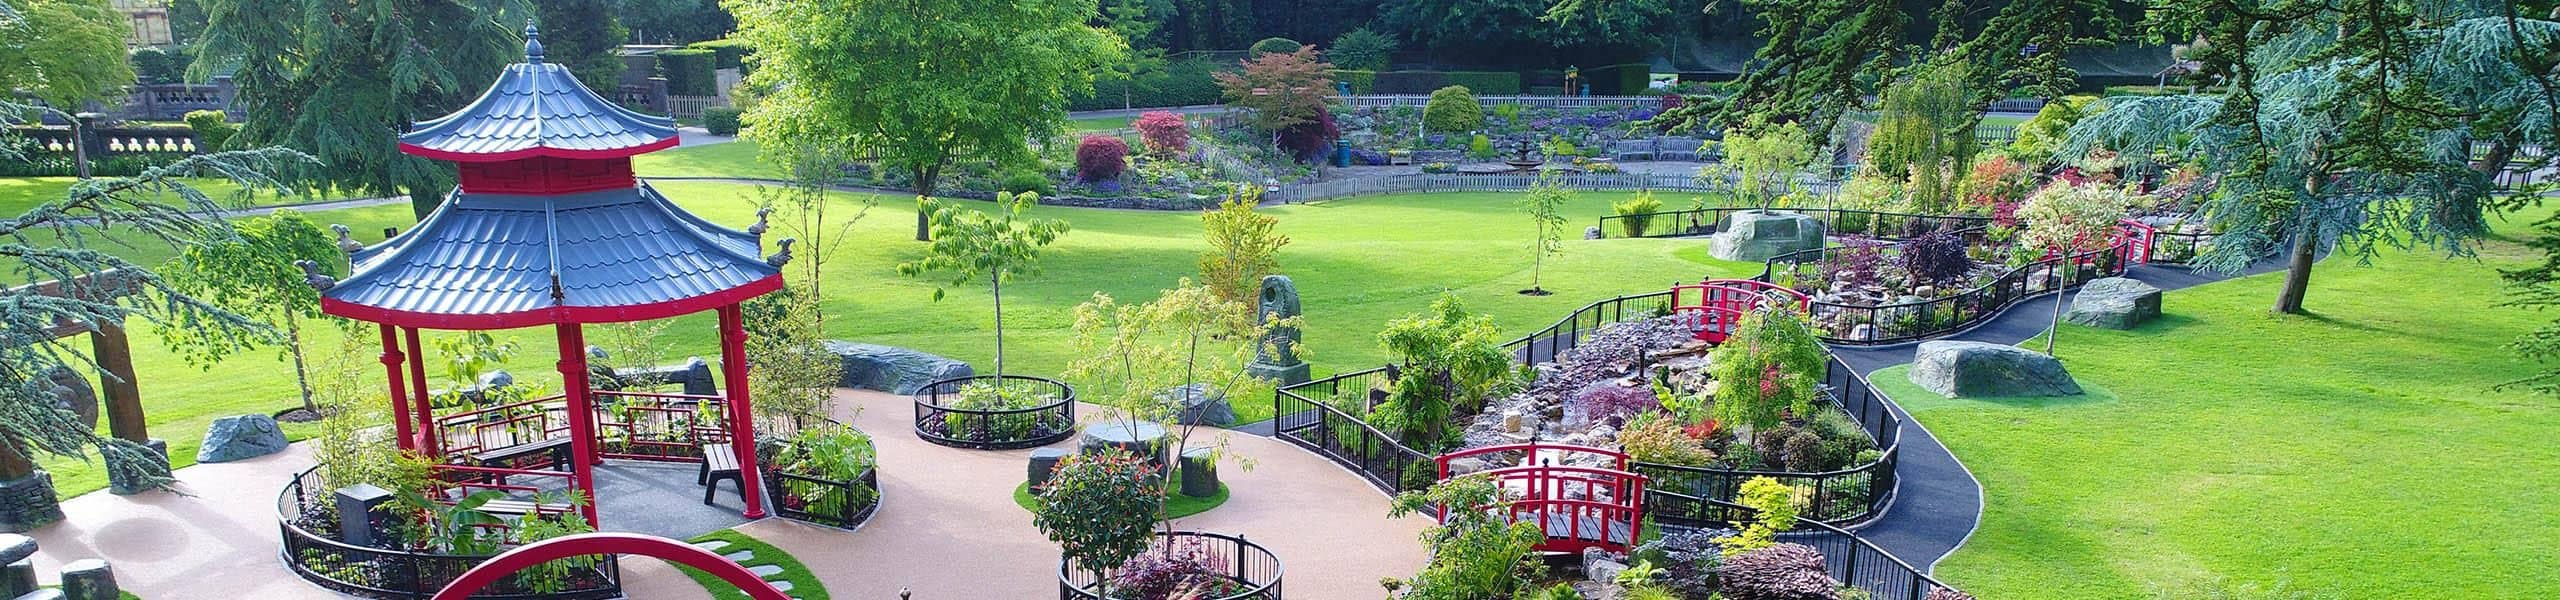 jap lawn portland present shop